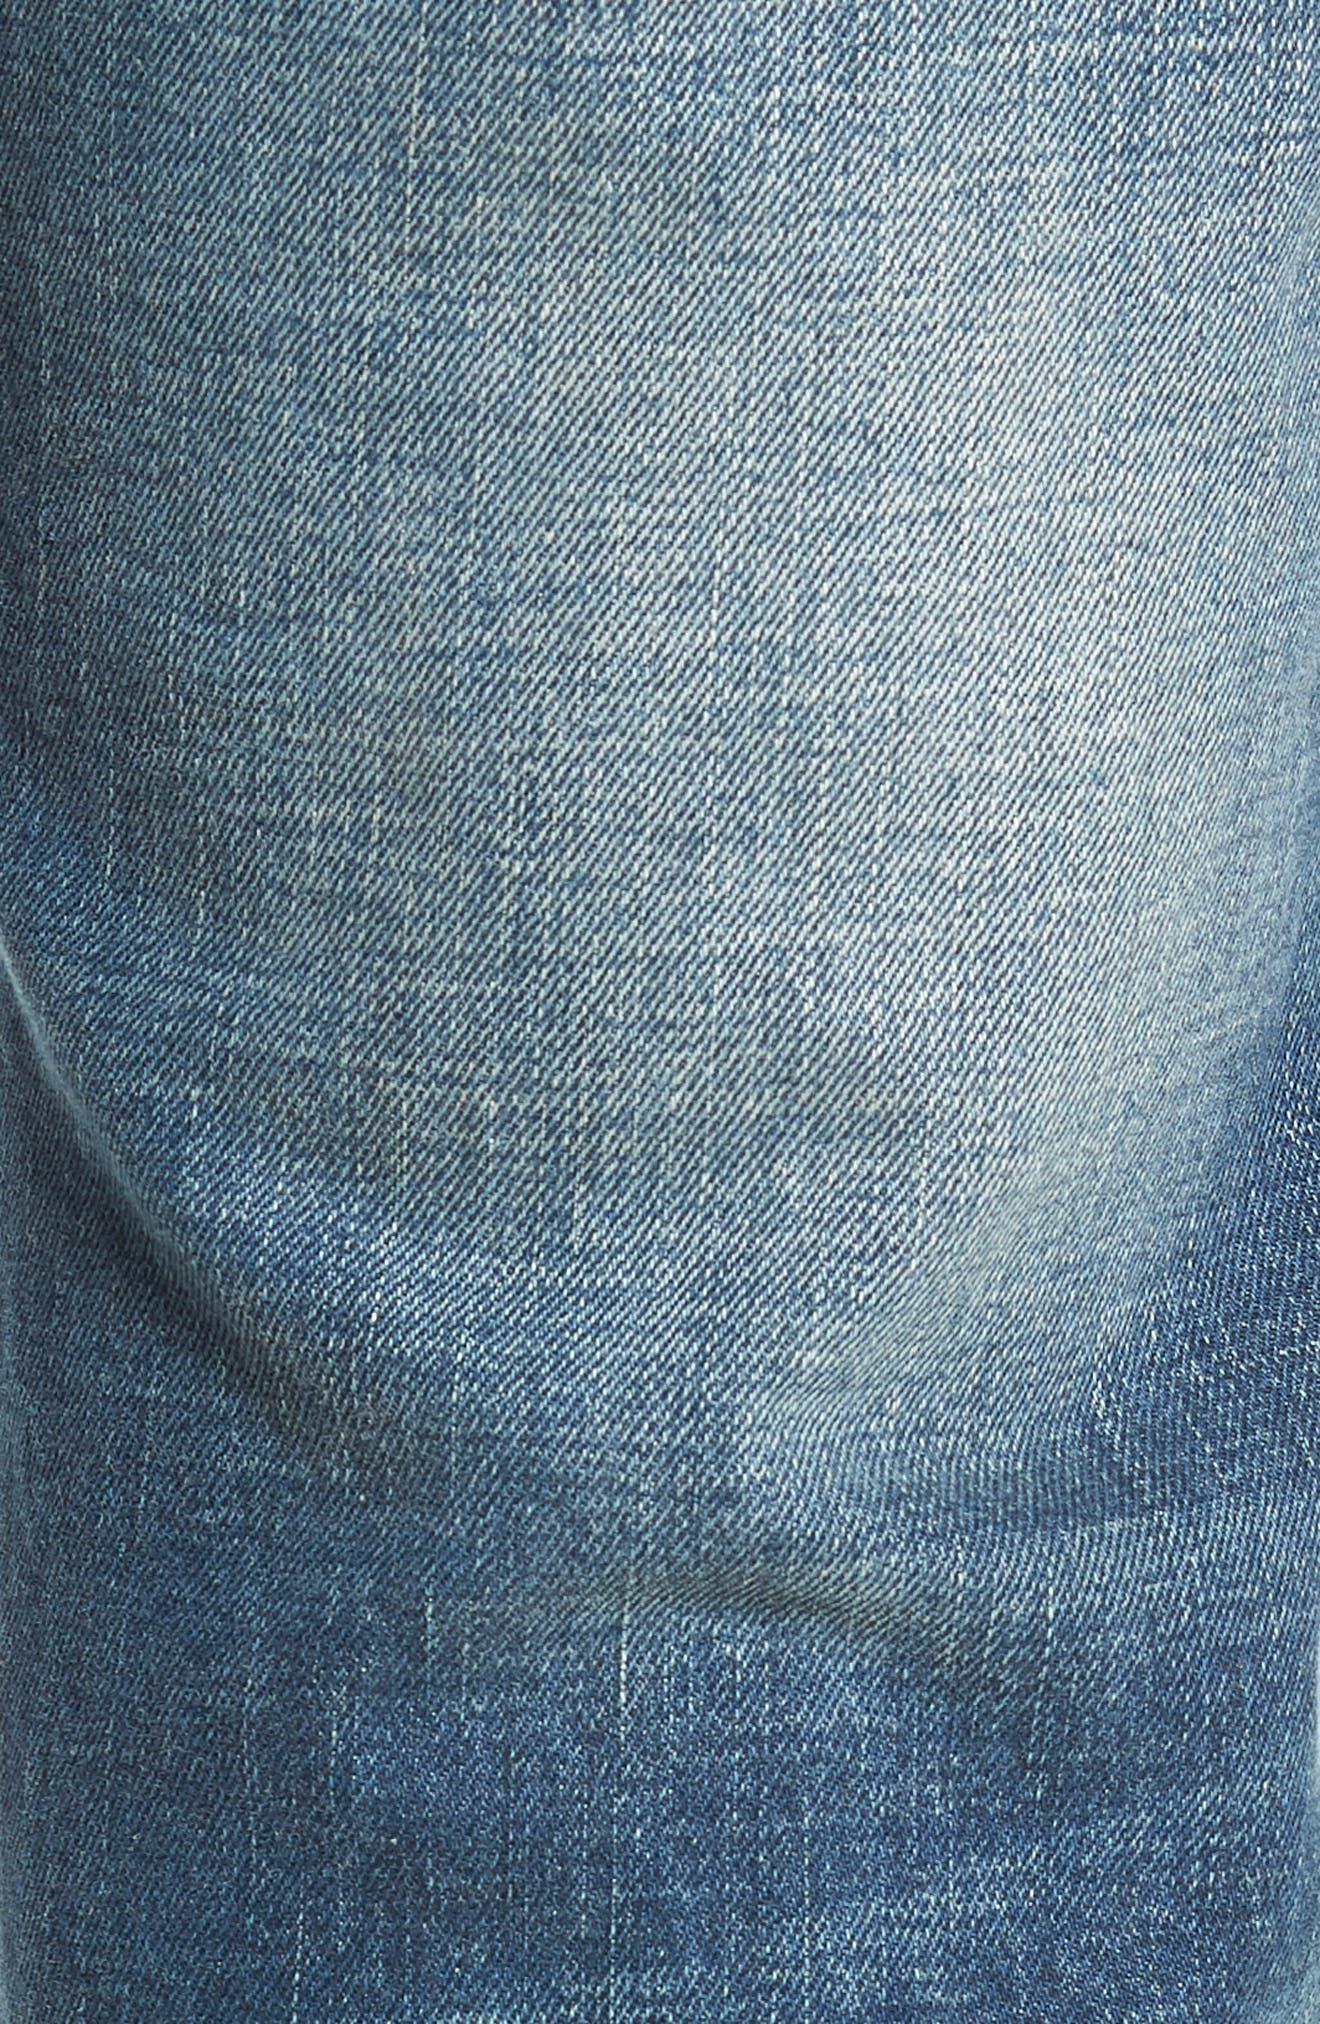 Mick Slim Fit Jeans,                             Alternate thumbnail 5, color,                             VINTAGE WASH